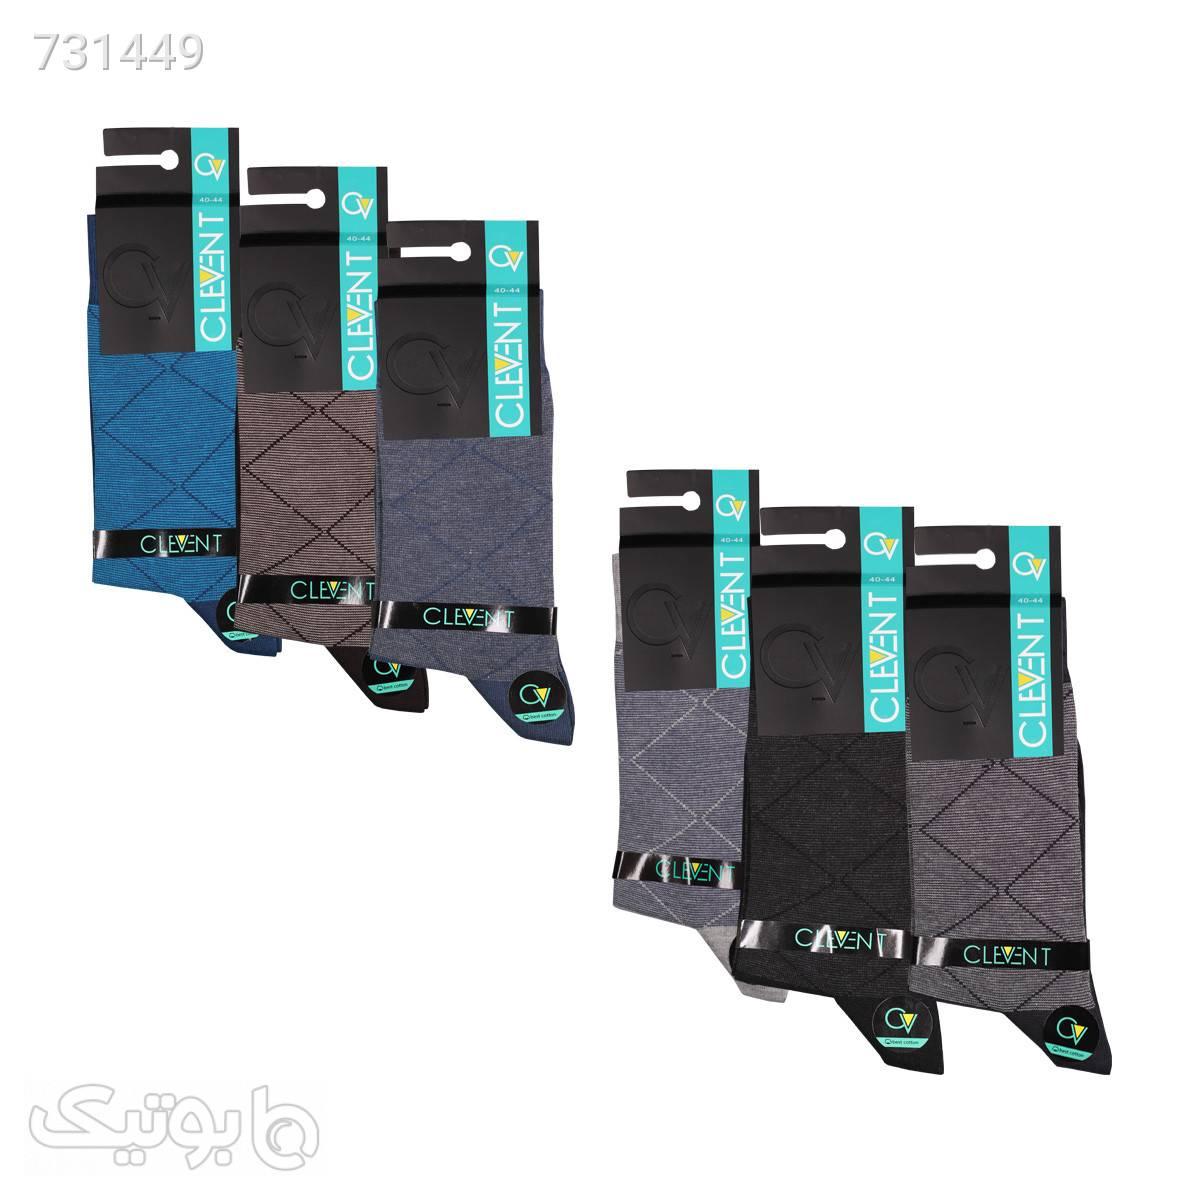 جوراب مردانه ۴۱۰۲ ساق دار بسته ۶ عددی برند CLEVENT کدsom1024 مشکی جوراب و پاپوش